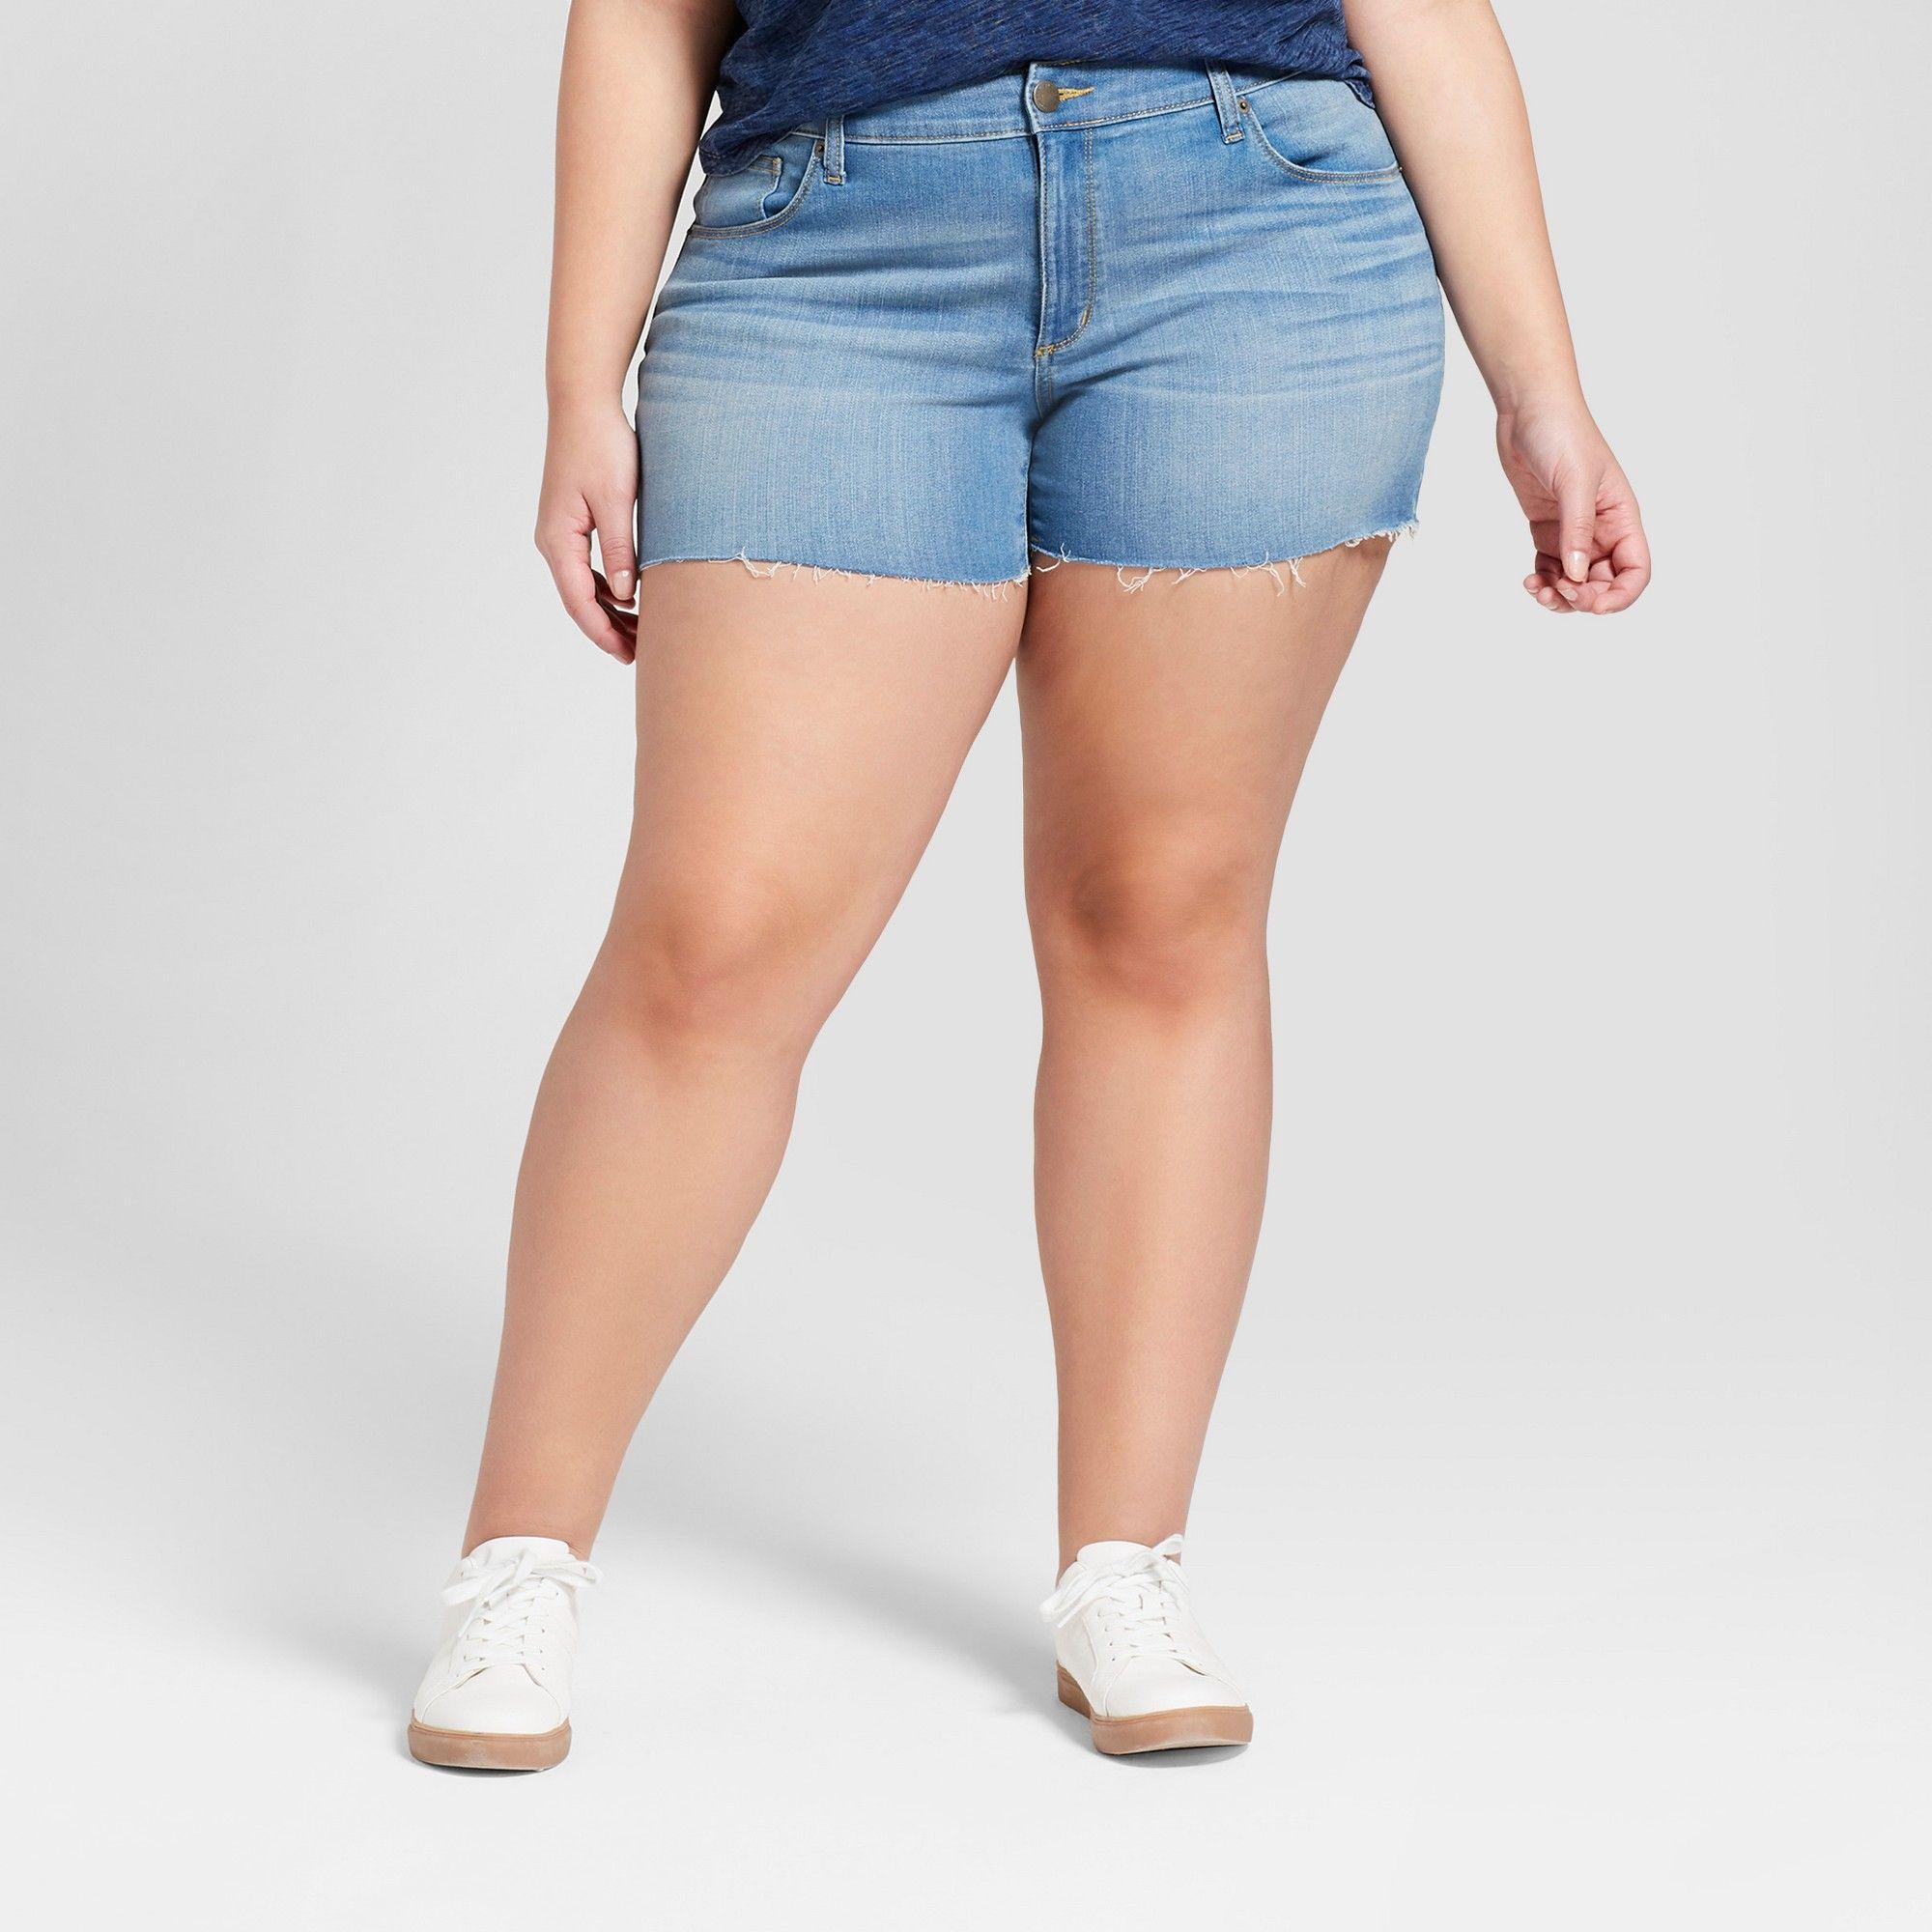 8a11f88853 Women s Plus Size Midi Jean Shorts - Universal Thread Light Wash 16W ...